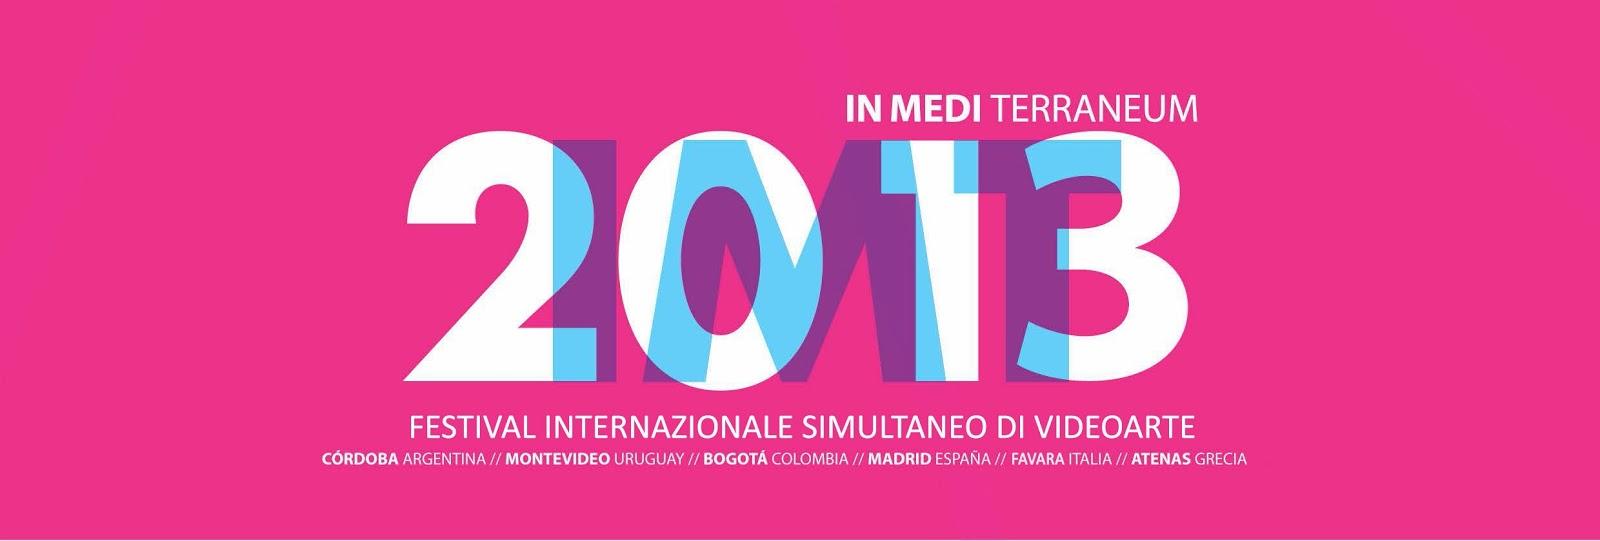 In Medi Terraneum 2013 - Festival Internazionale Simultaneo di Video Arte